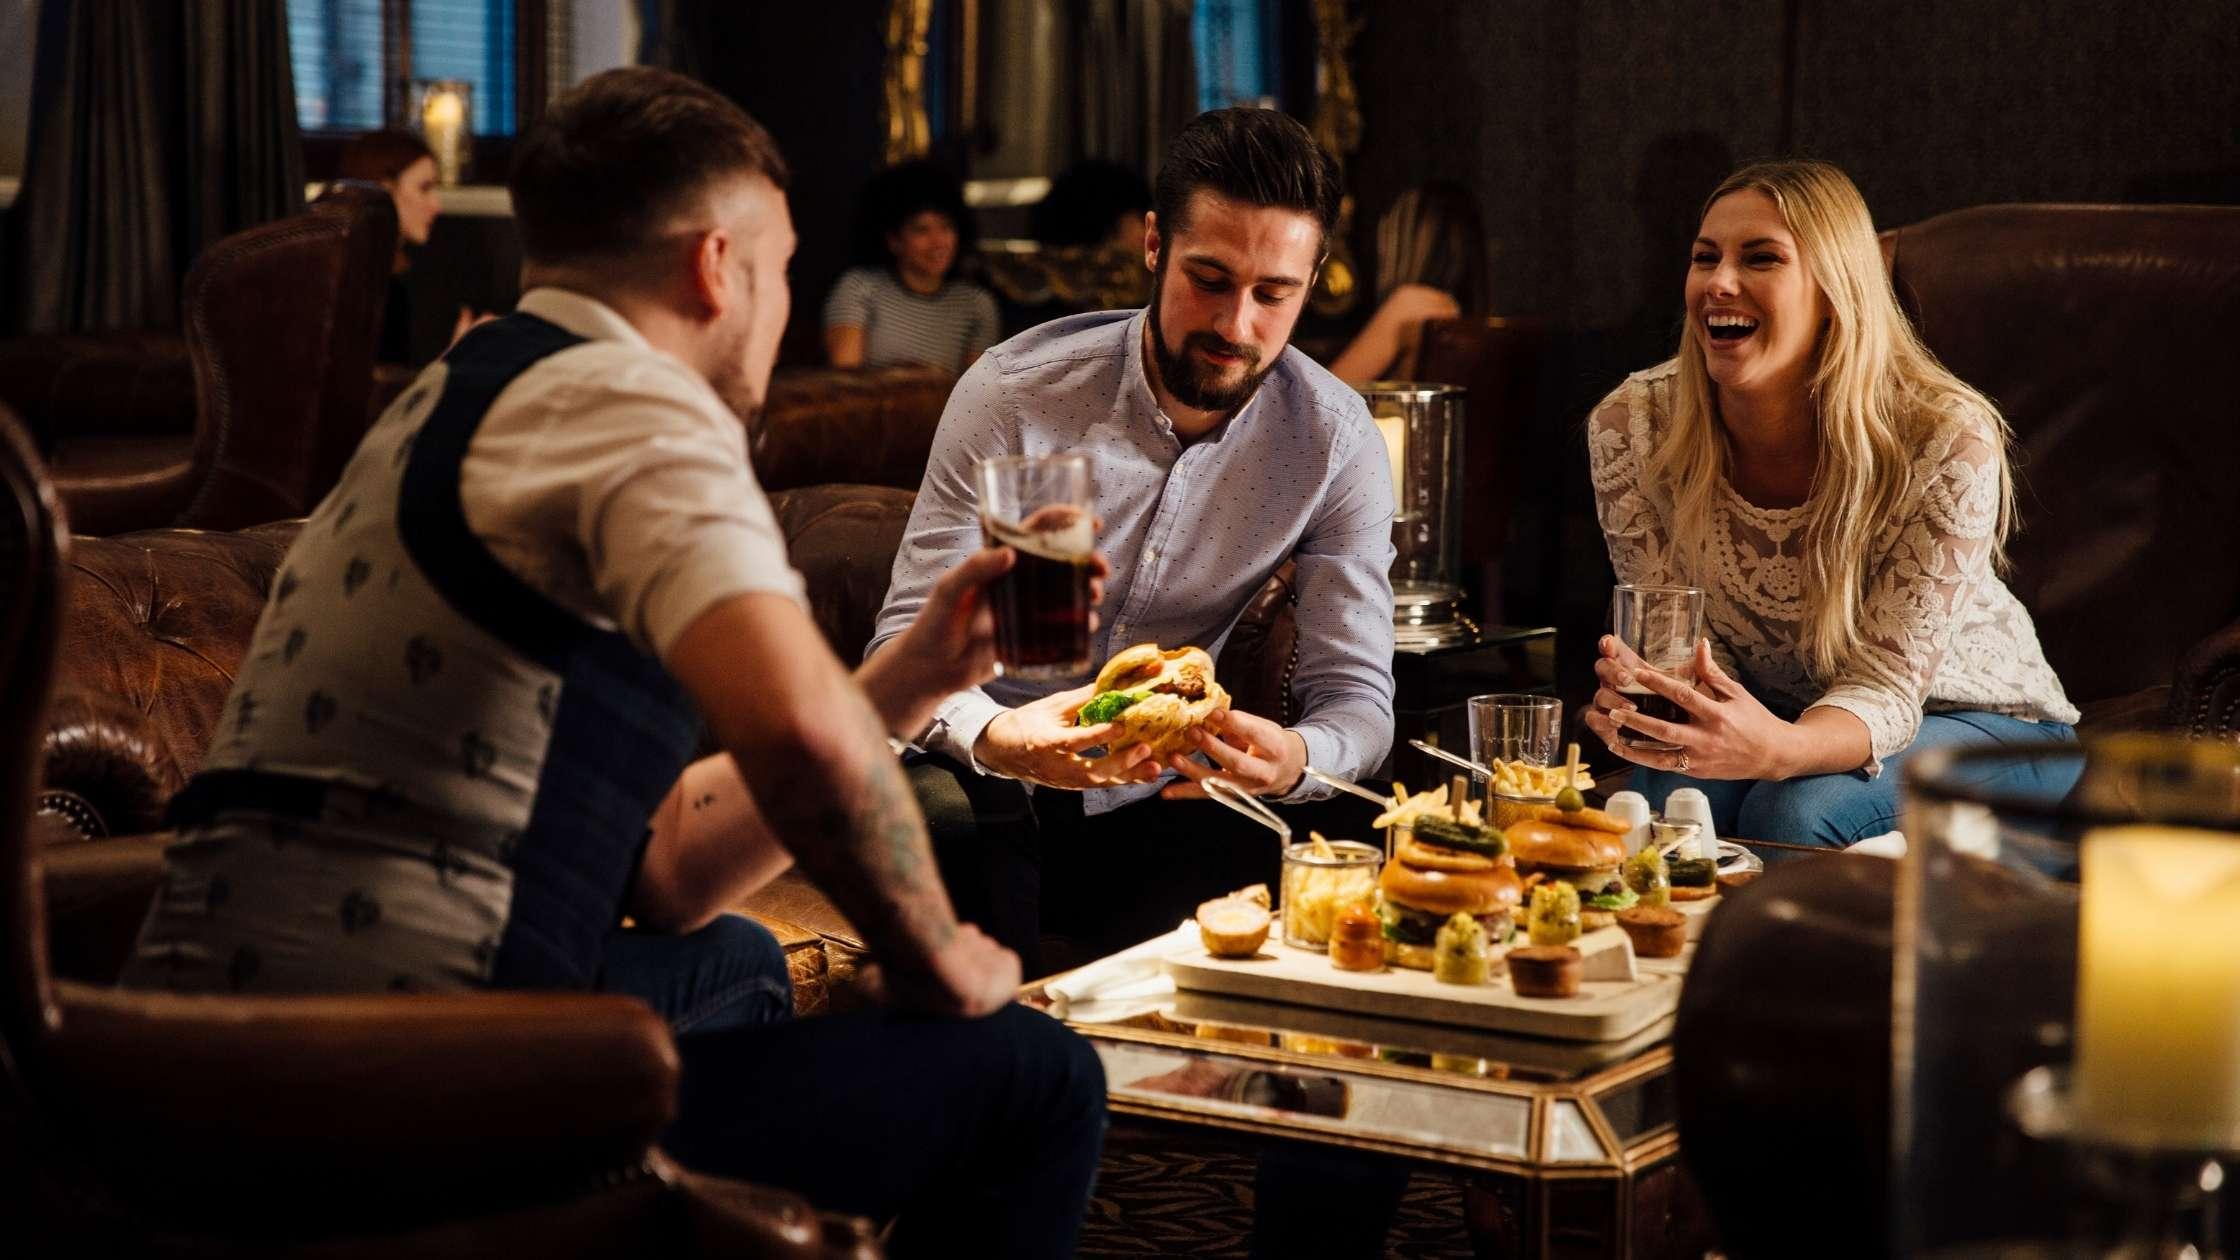 Best Pubs In High Street Kensington - London Kensington Guide